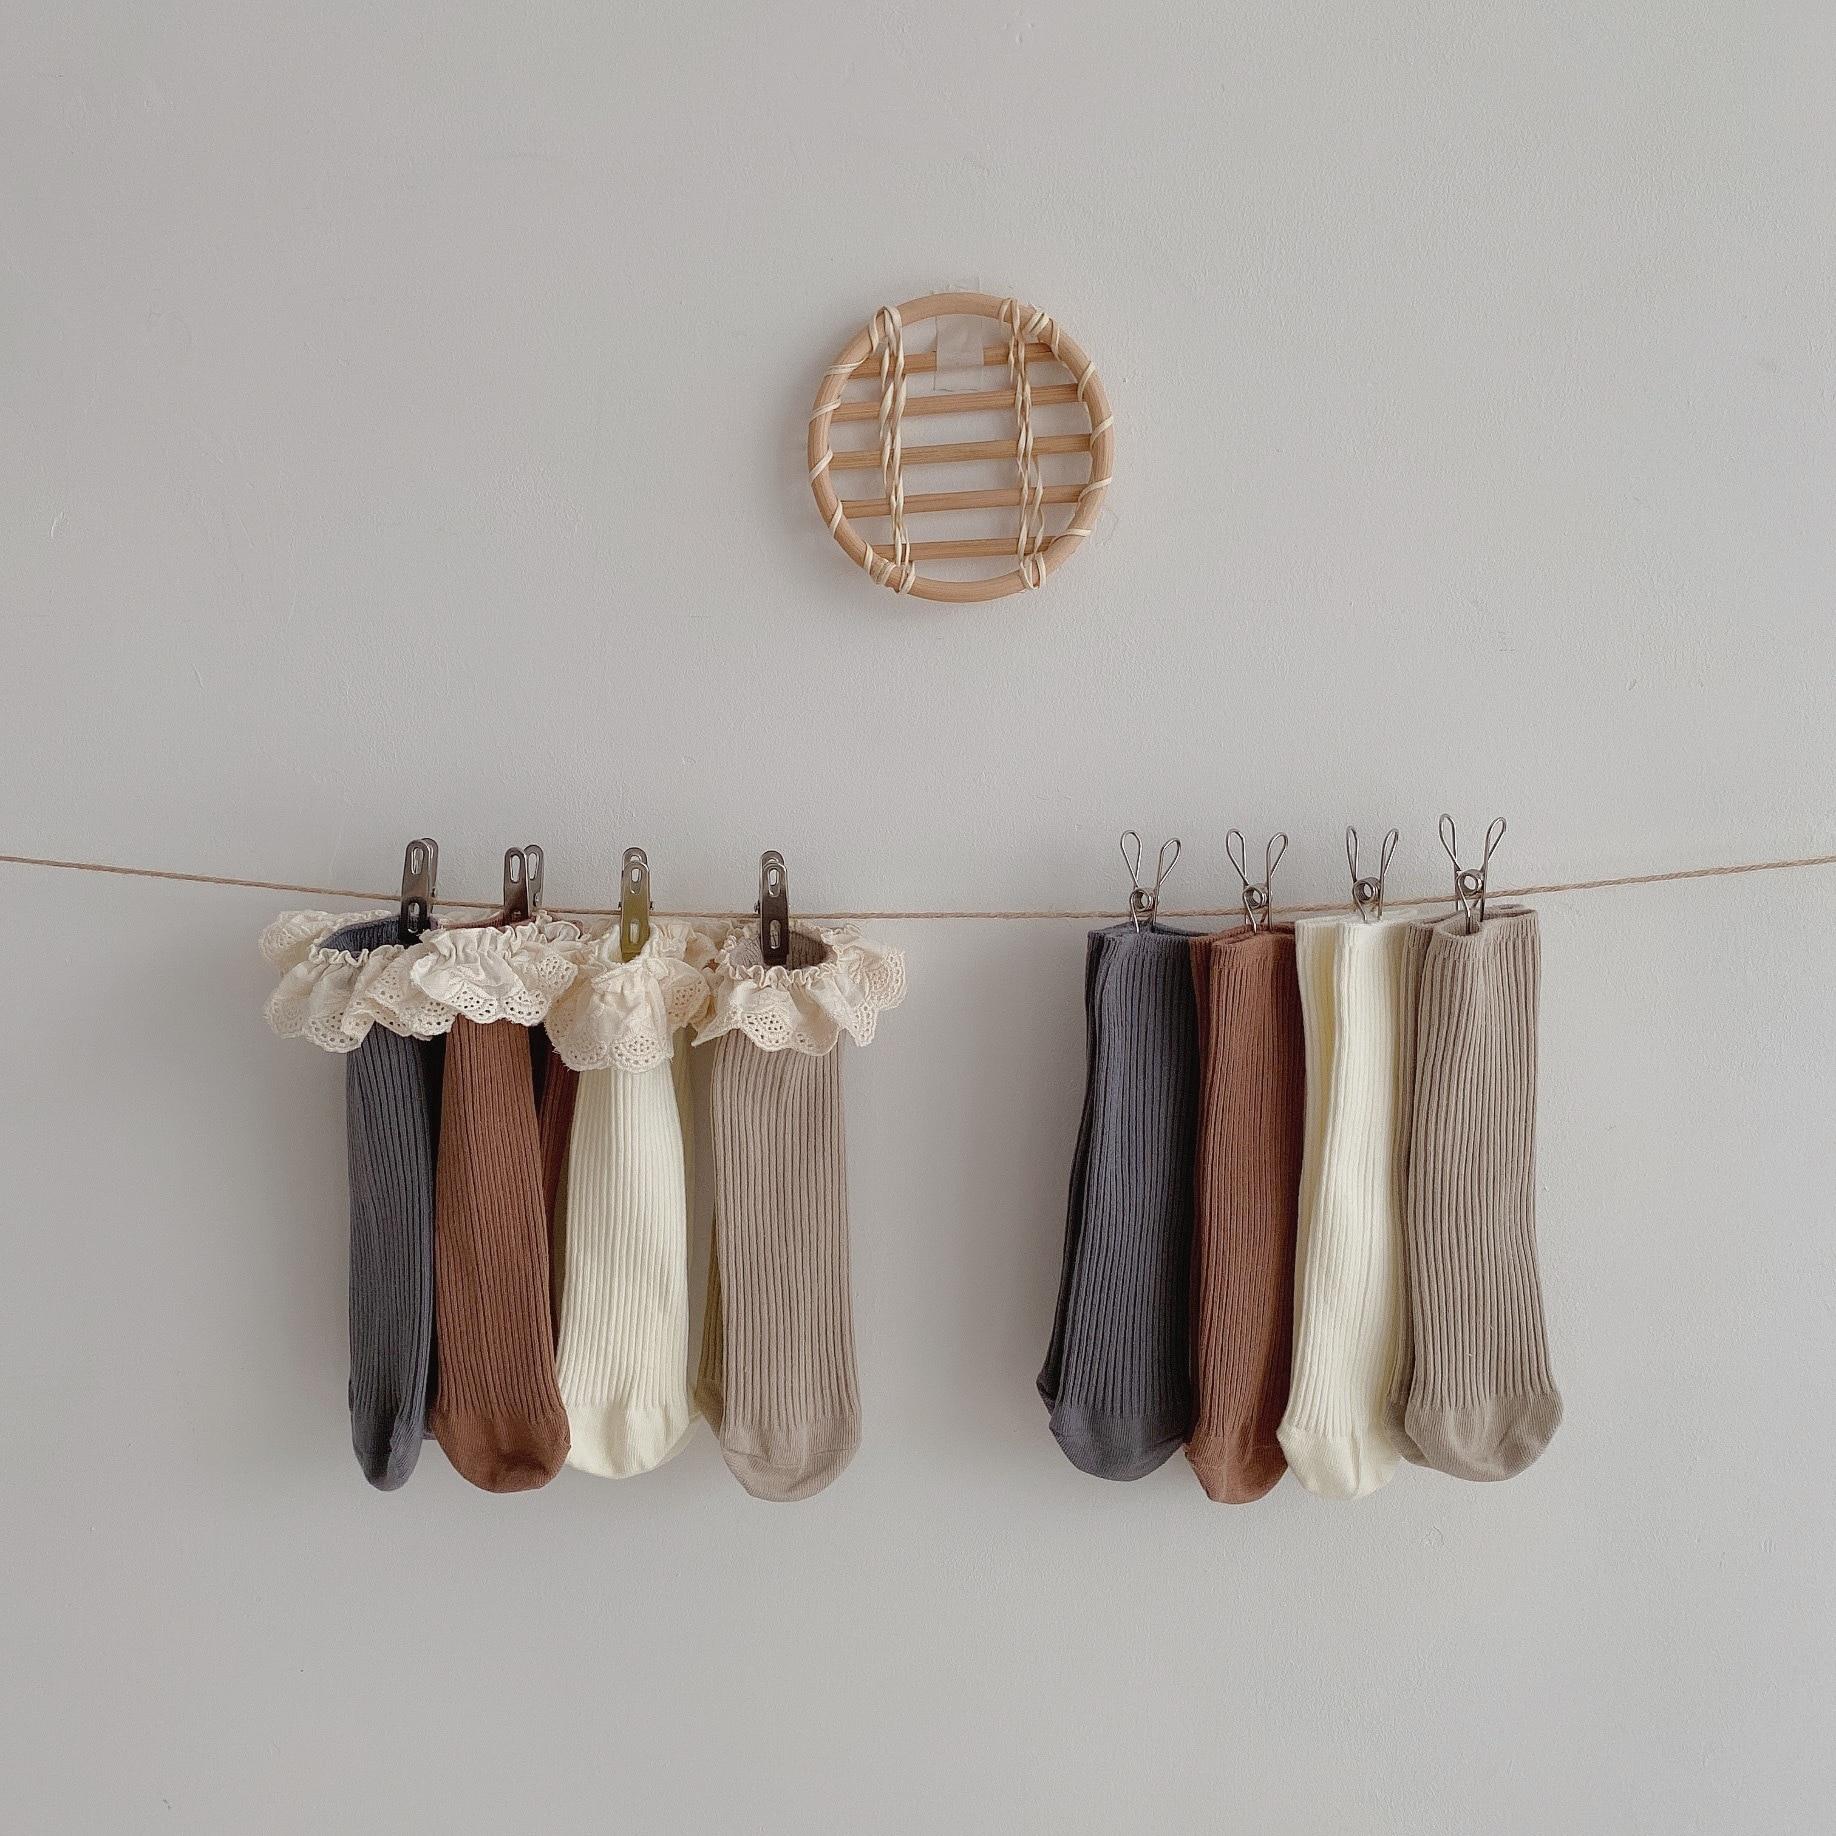 4 Pairs/lot New Baby Girls Socks Long Socks Kids Knee Length Soft Cotton Baby Socks Kids 1-6 Years Knee High Socks 6